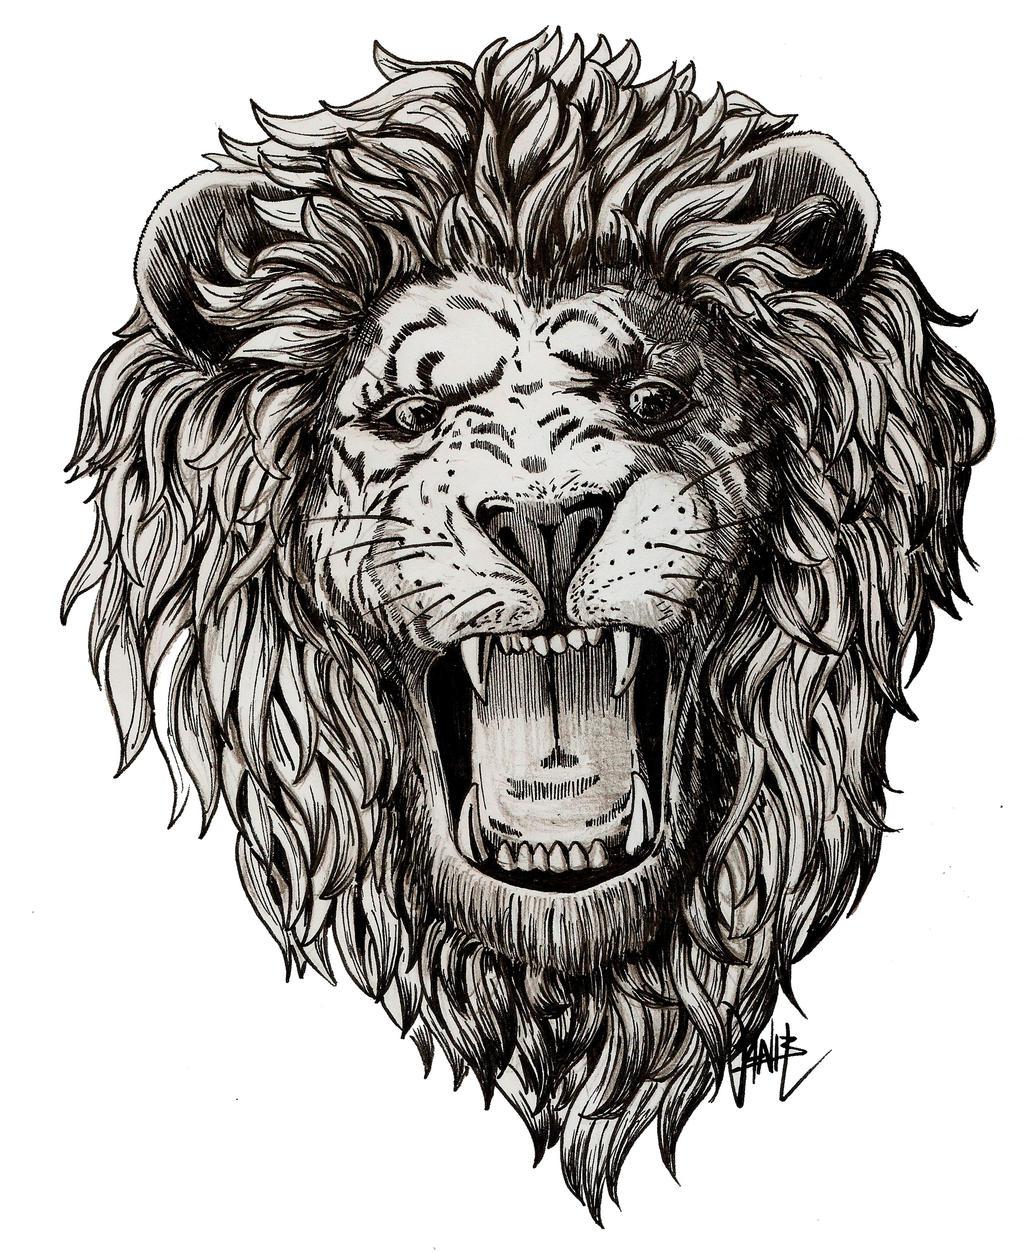 Lion roar by danillustration on DeviantArt